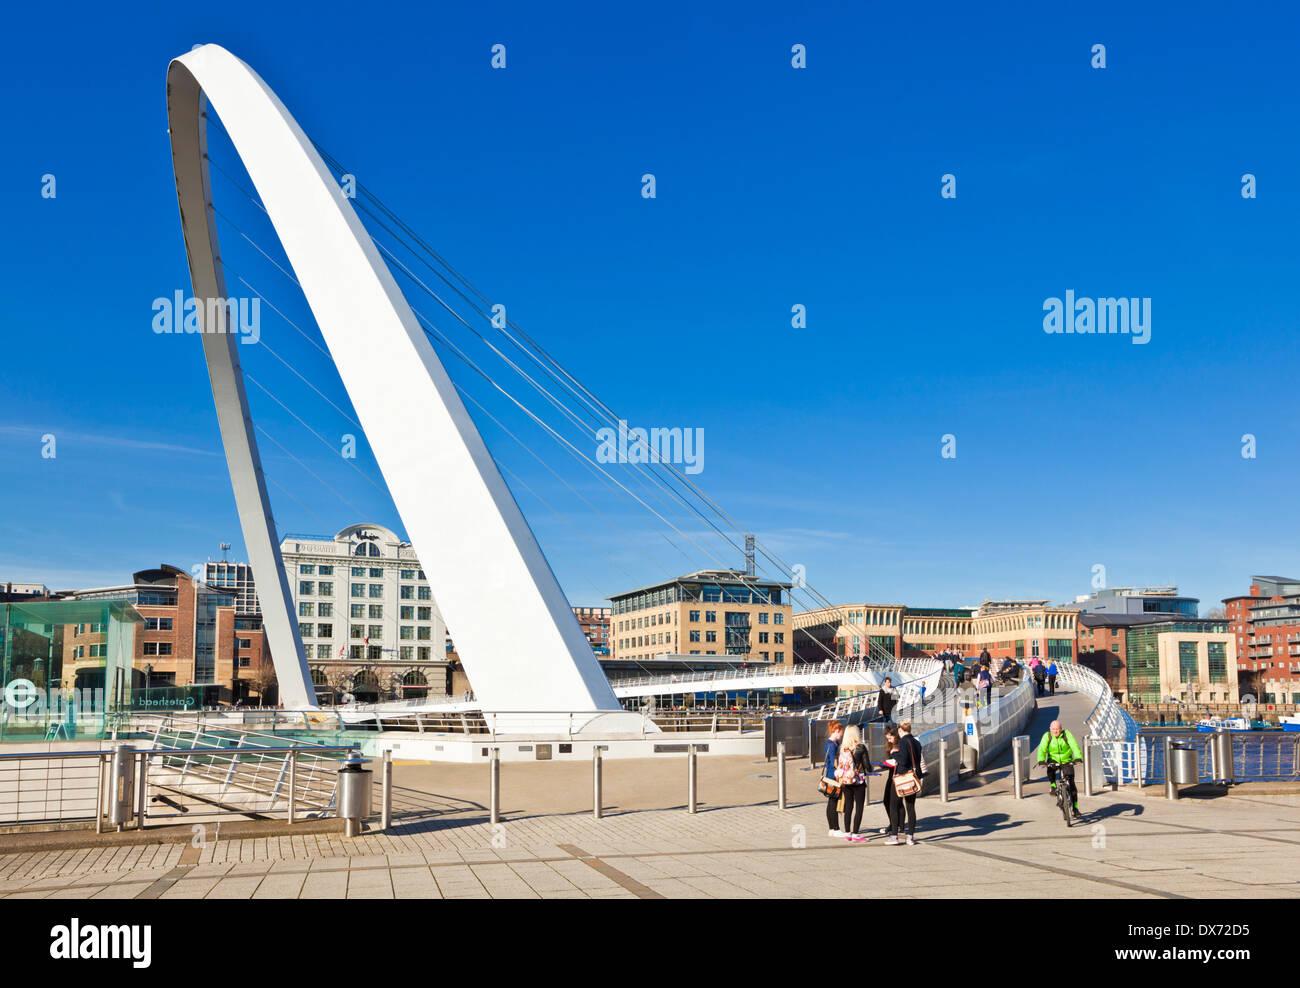 gateshead Millennium bridge over River Tyne Newcastle upon Tyne Tyne and Wear Tyneside England UK GB EU Europe - Stock Image